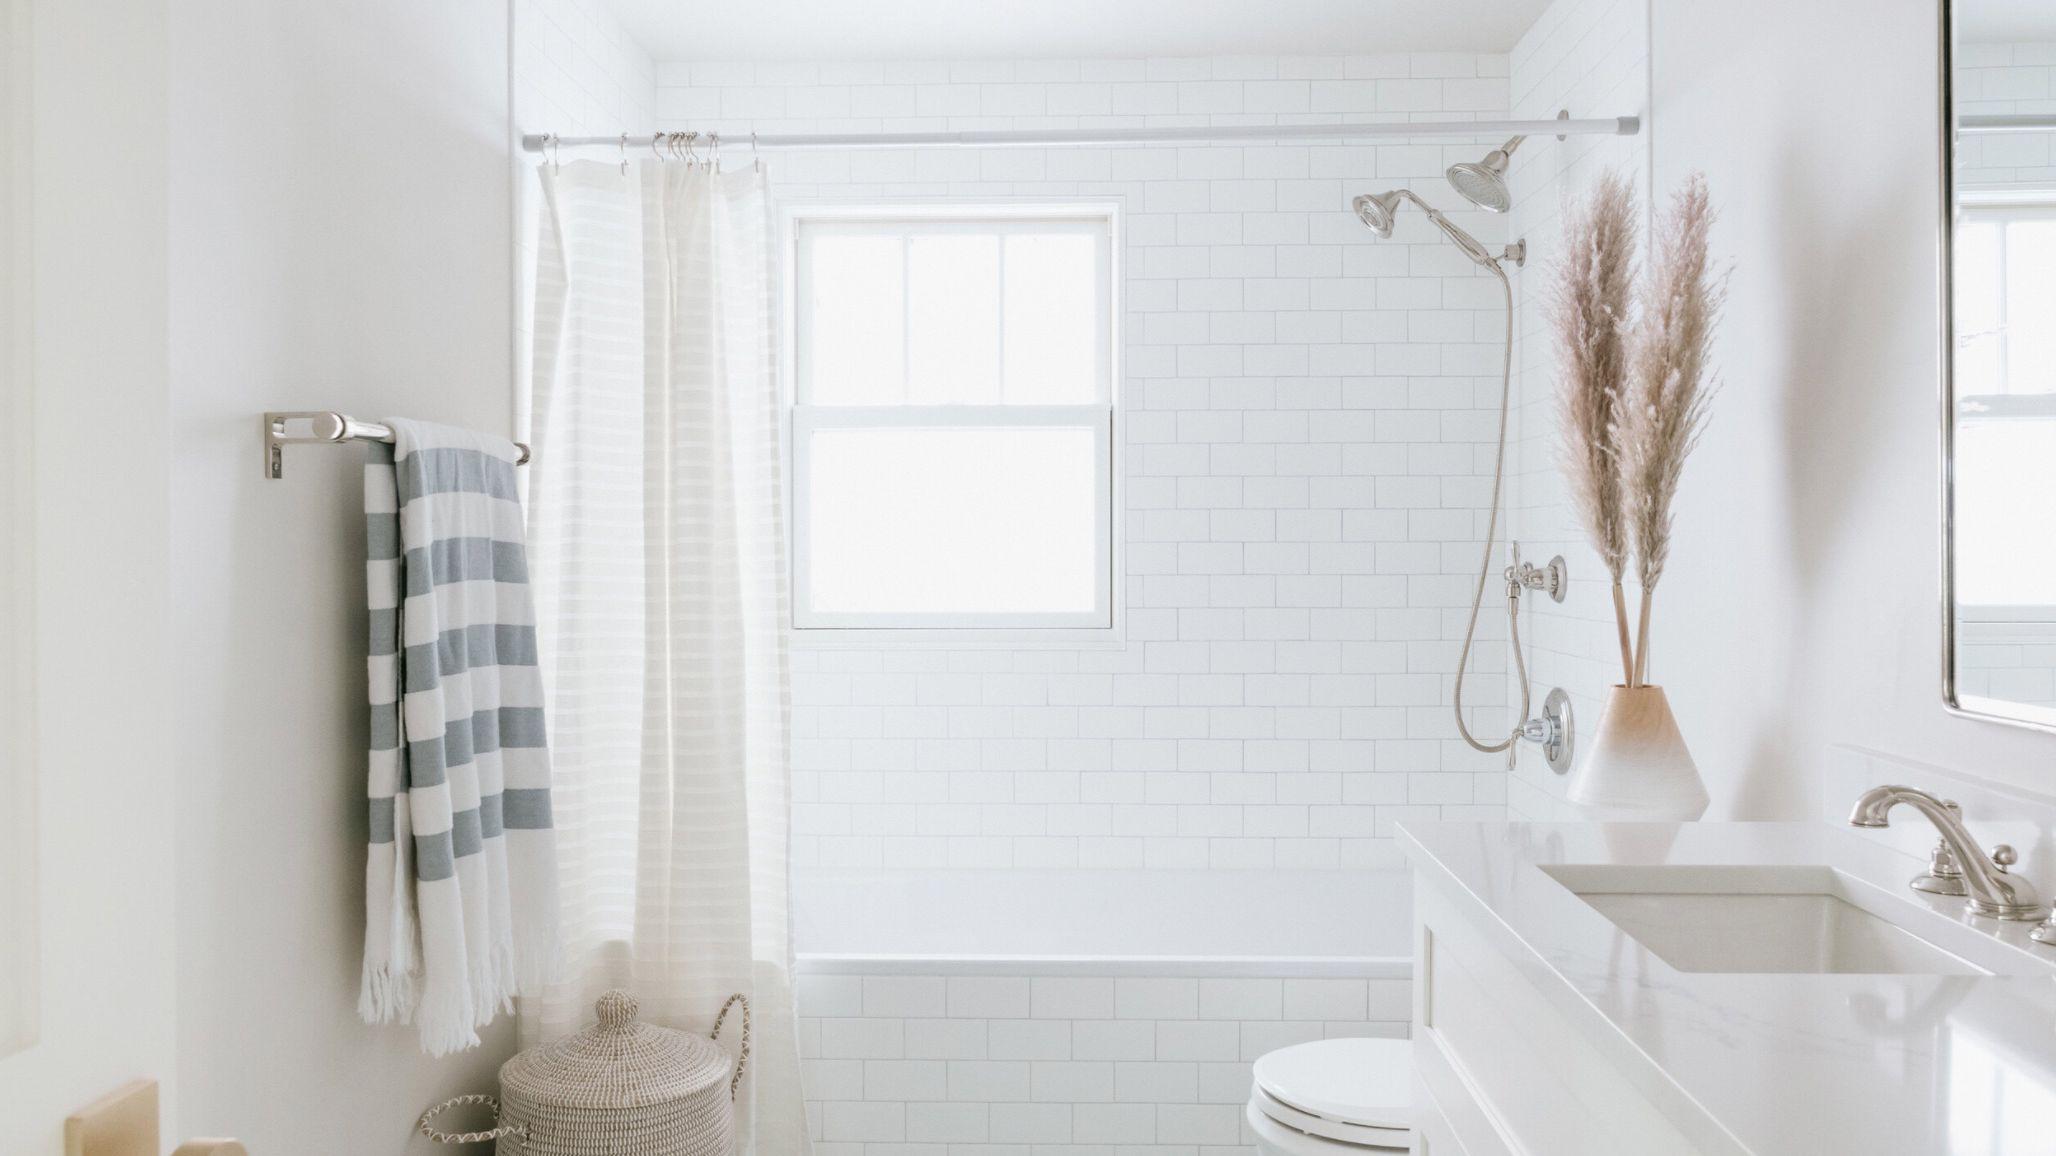 27 Small Bathroom Ideas From Interior, Design Ideas For Small Bathrooms